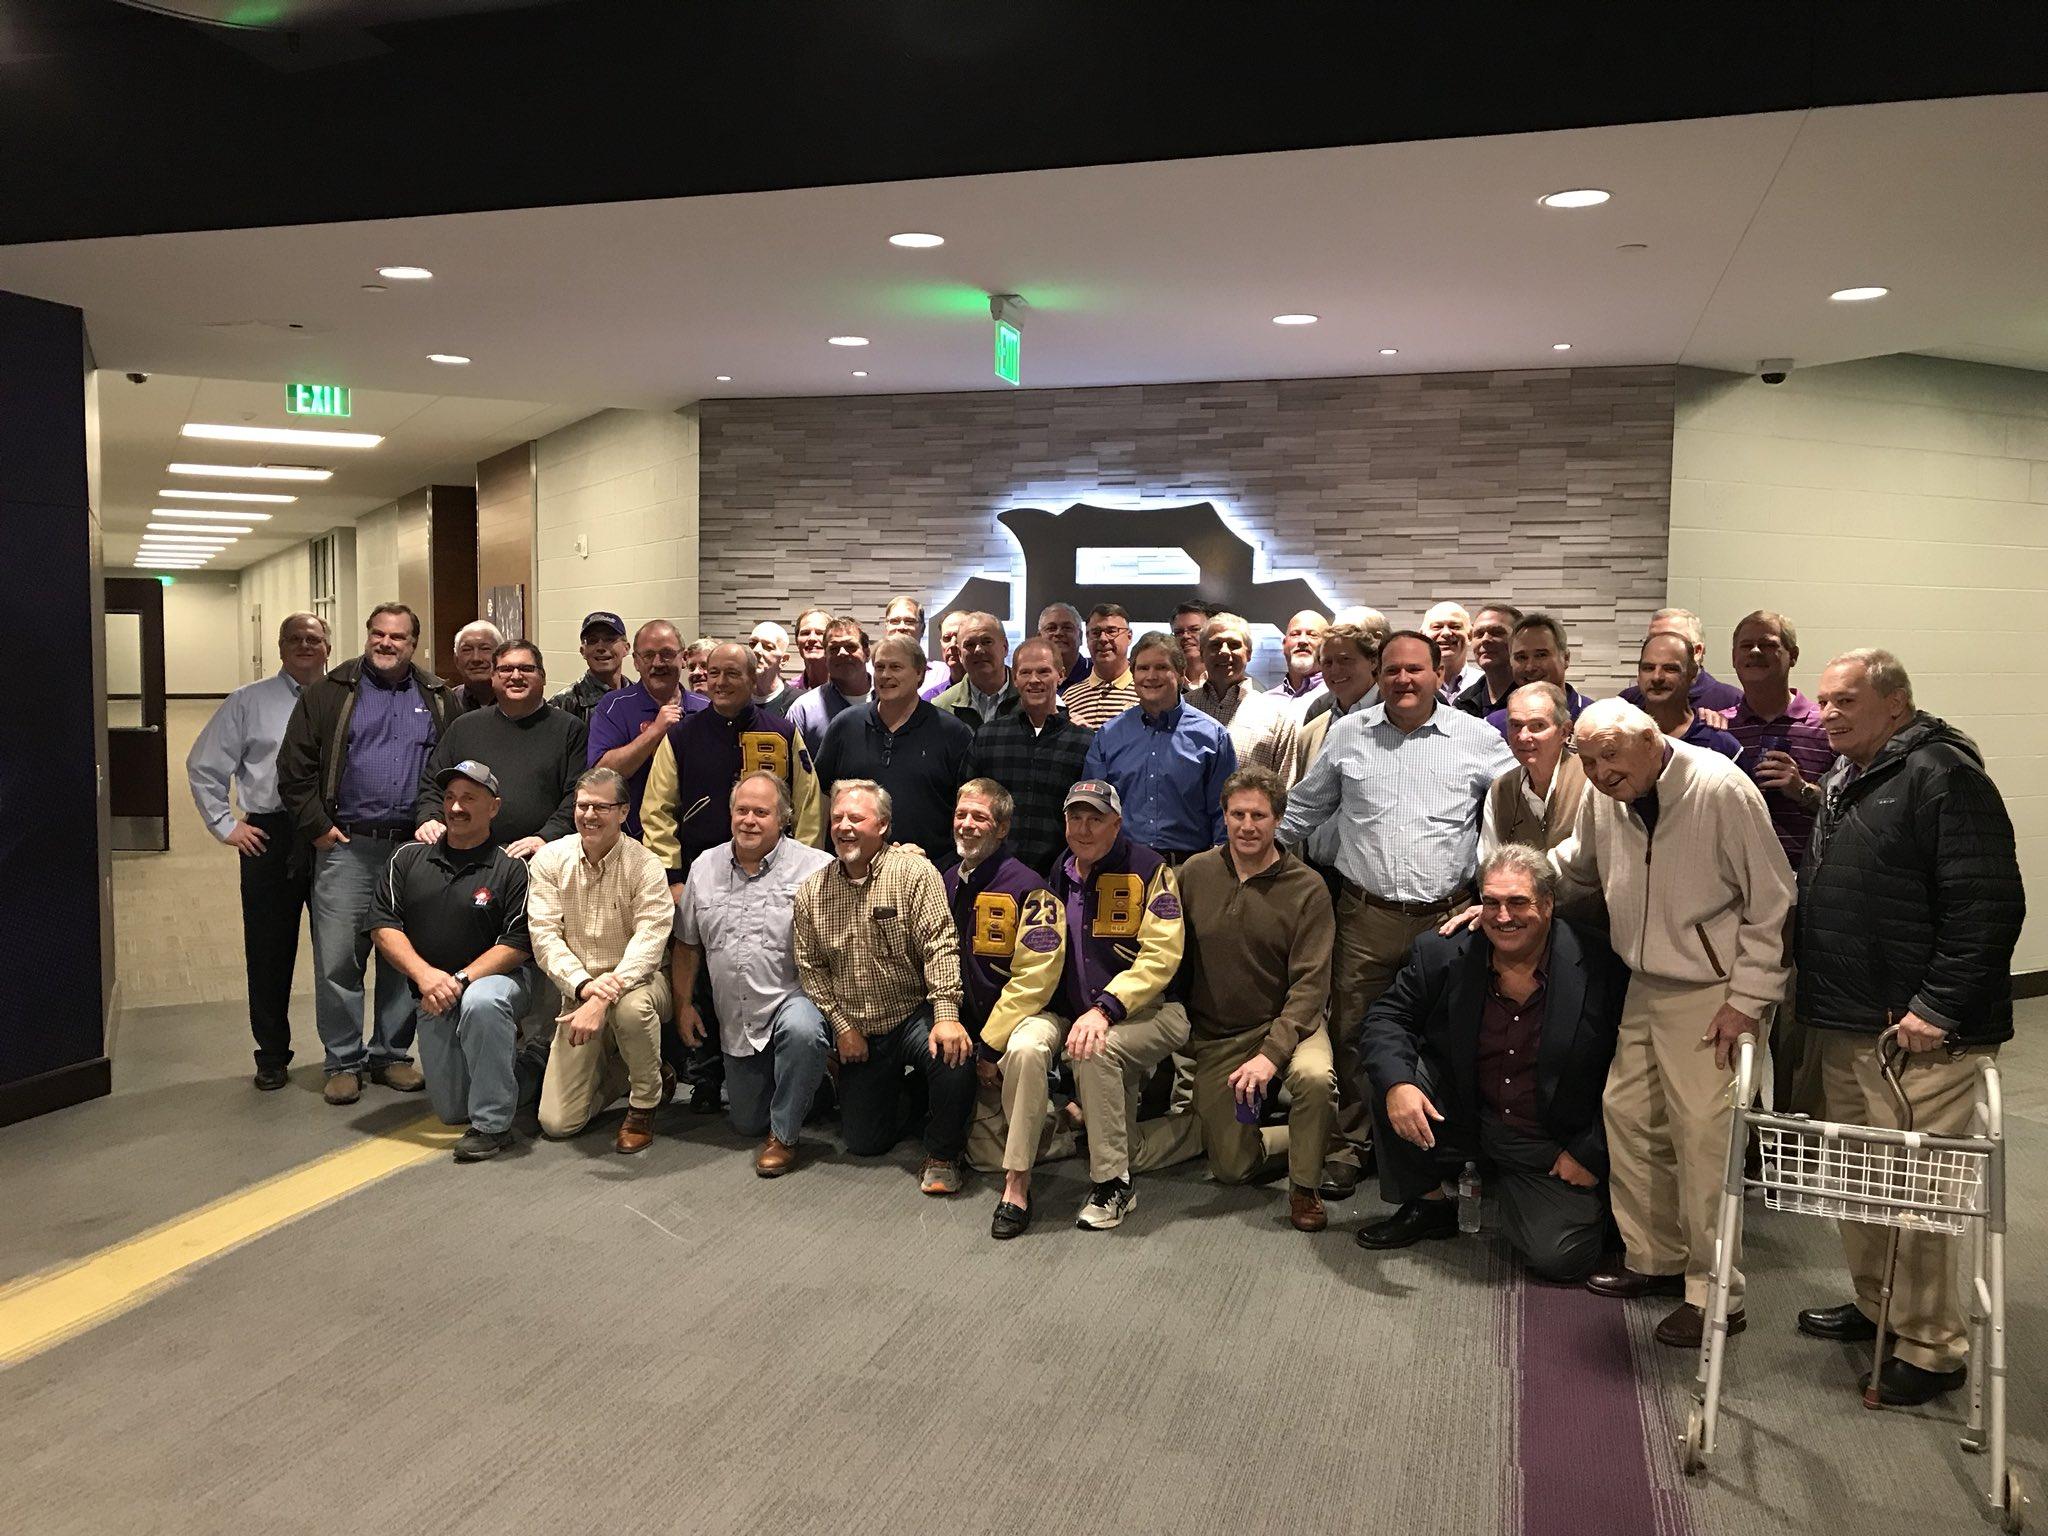 1977 state champ team reunion